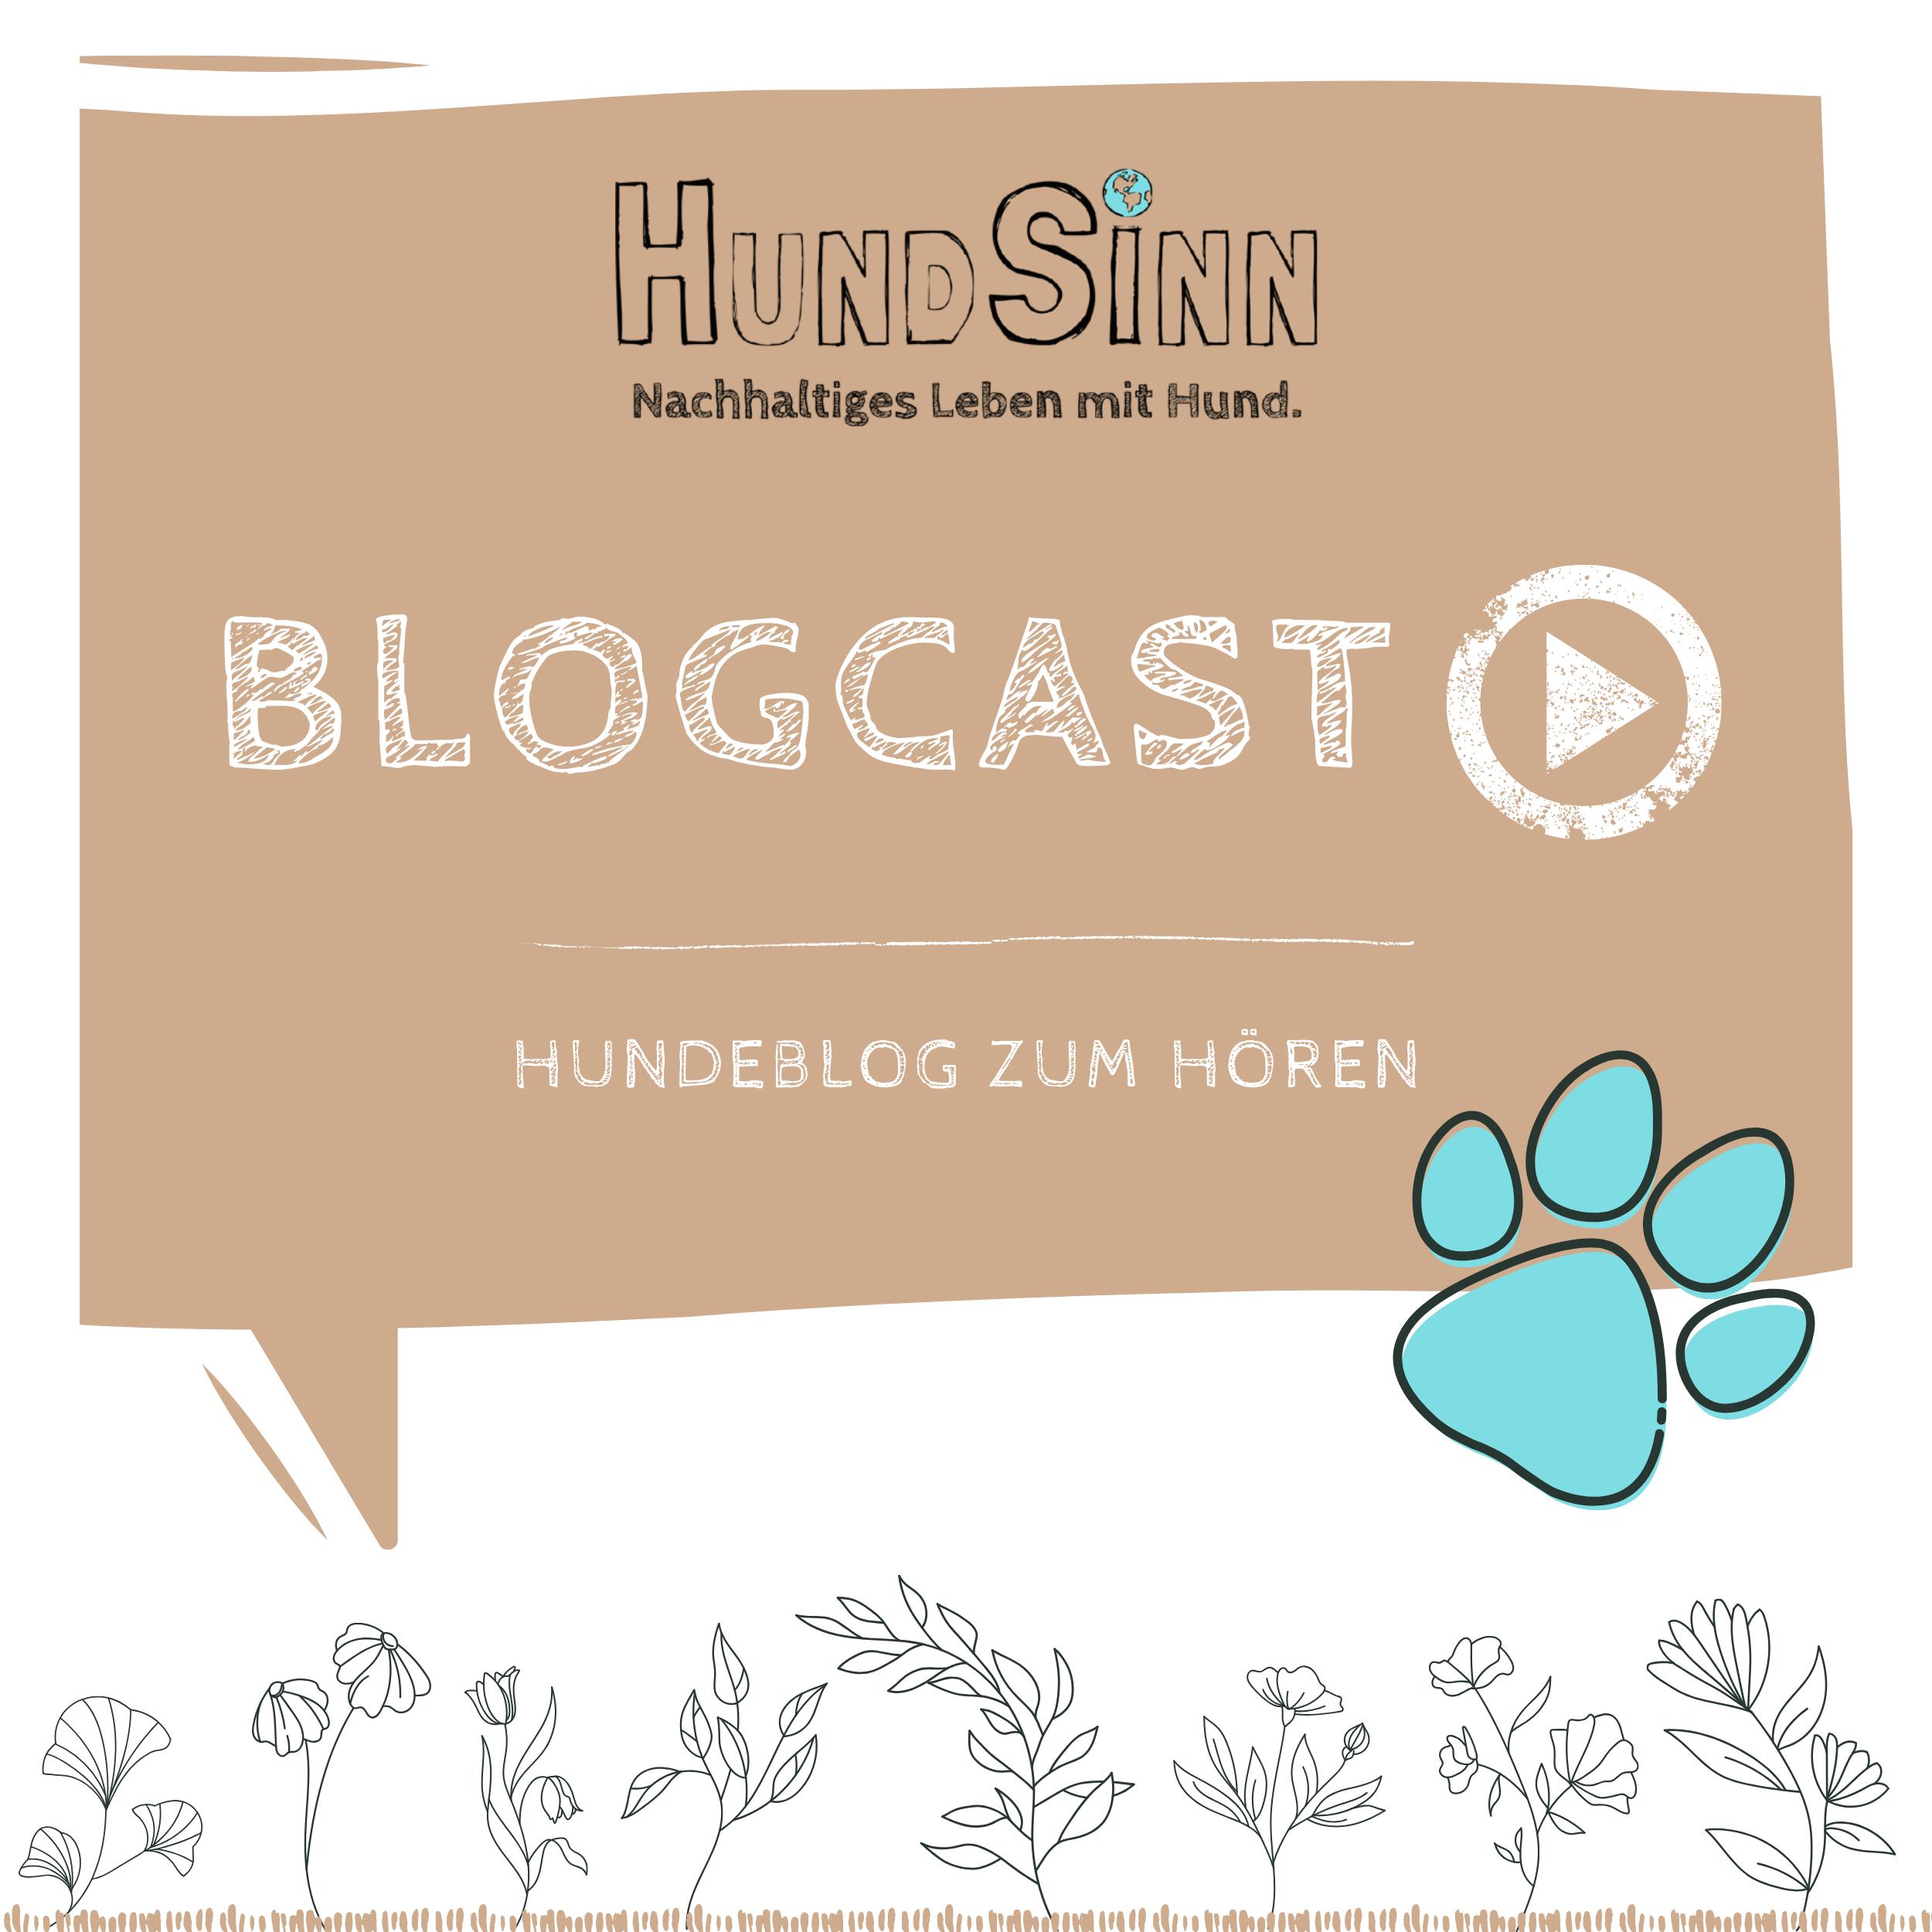 HundSinn - Der Blogcast